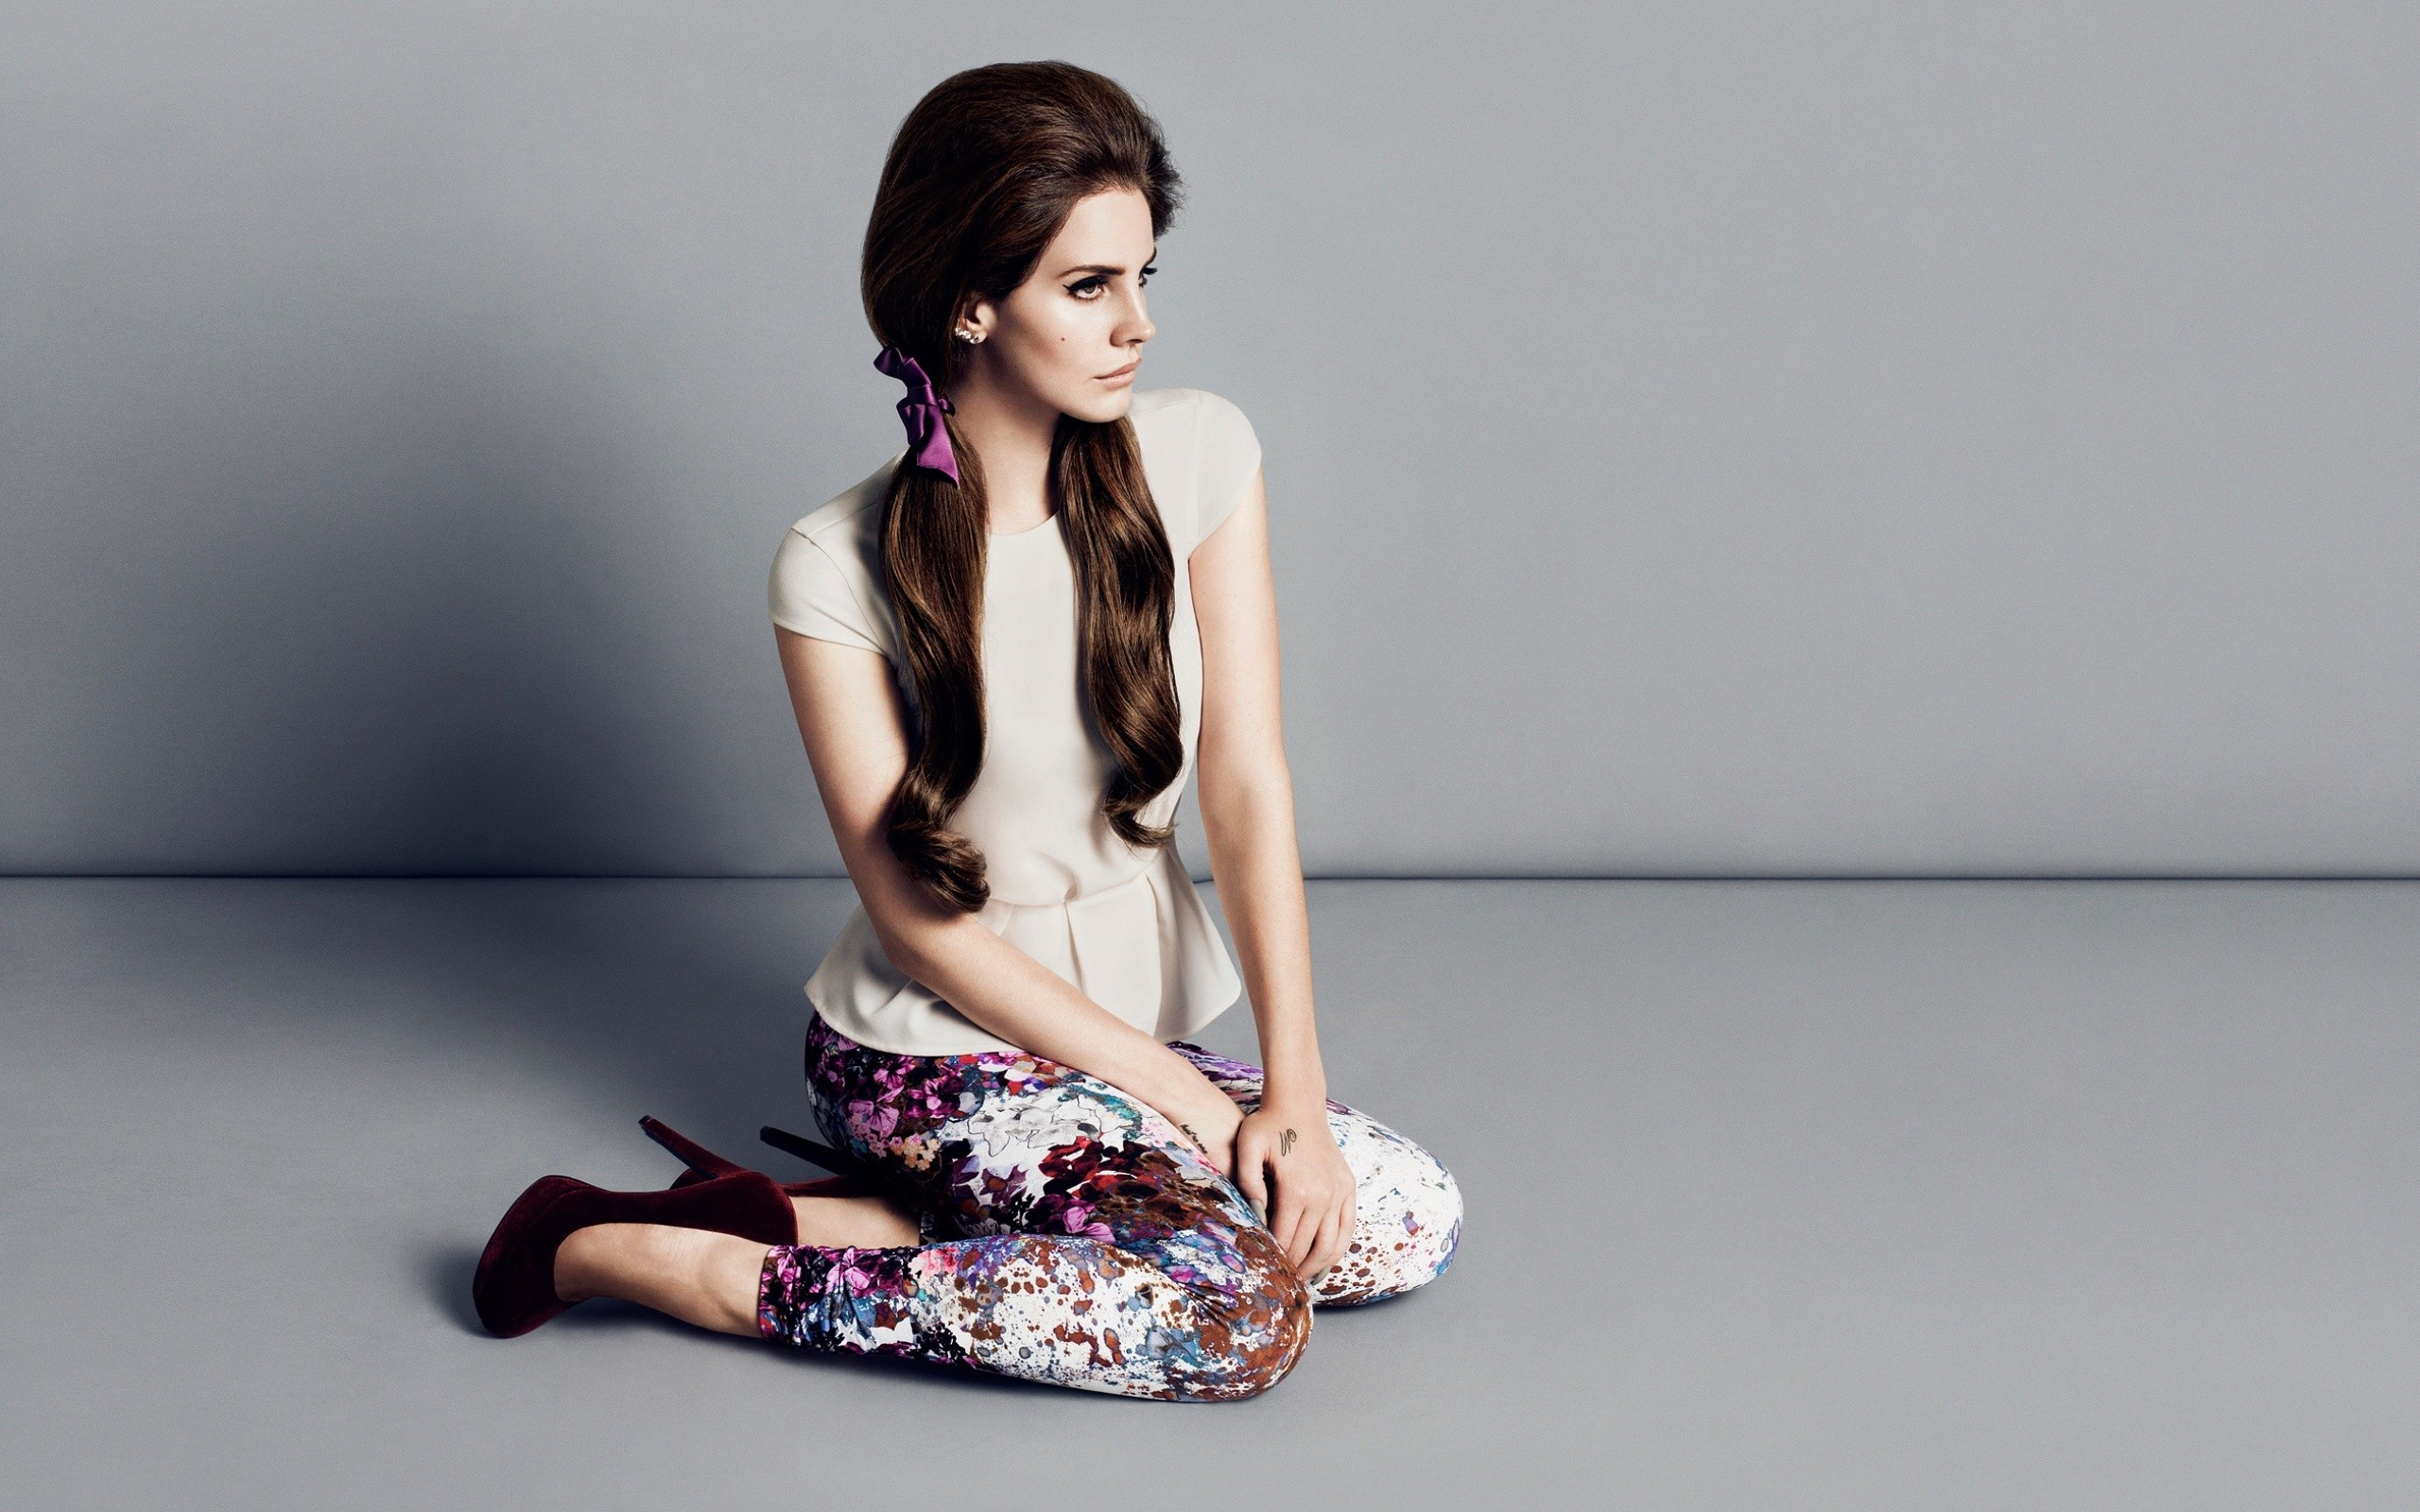 Lana Del Rey for mobile